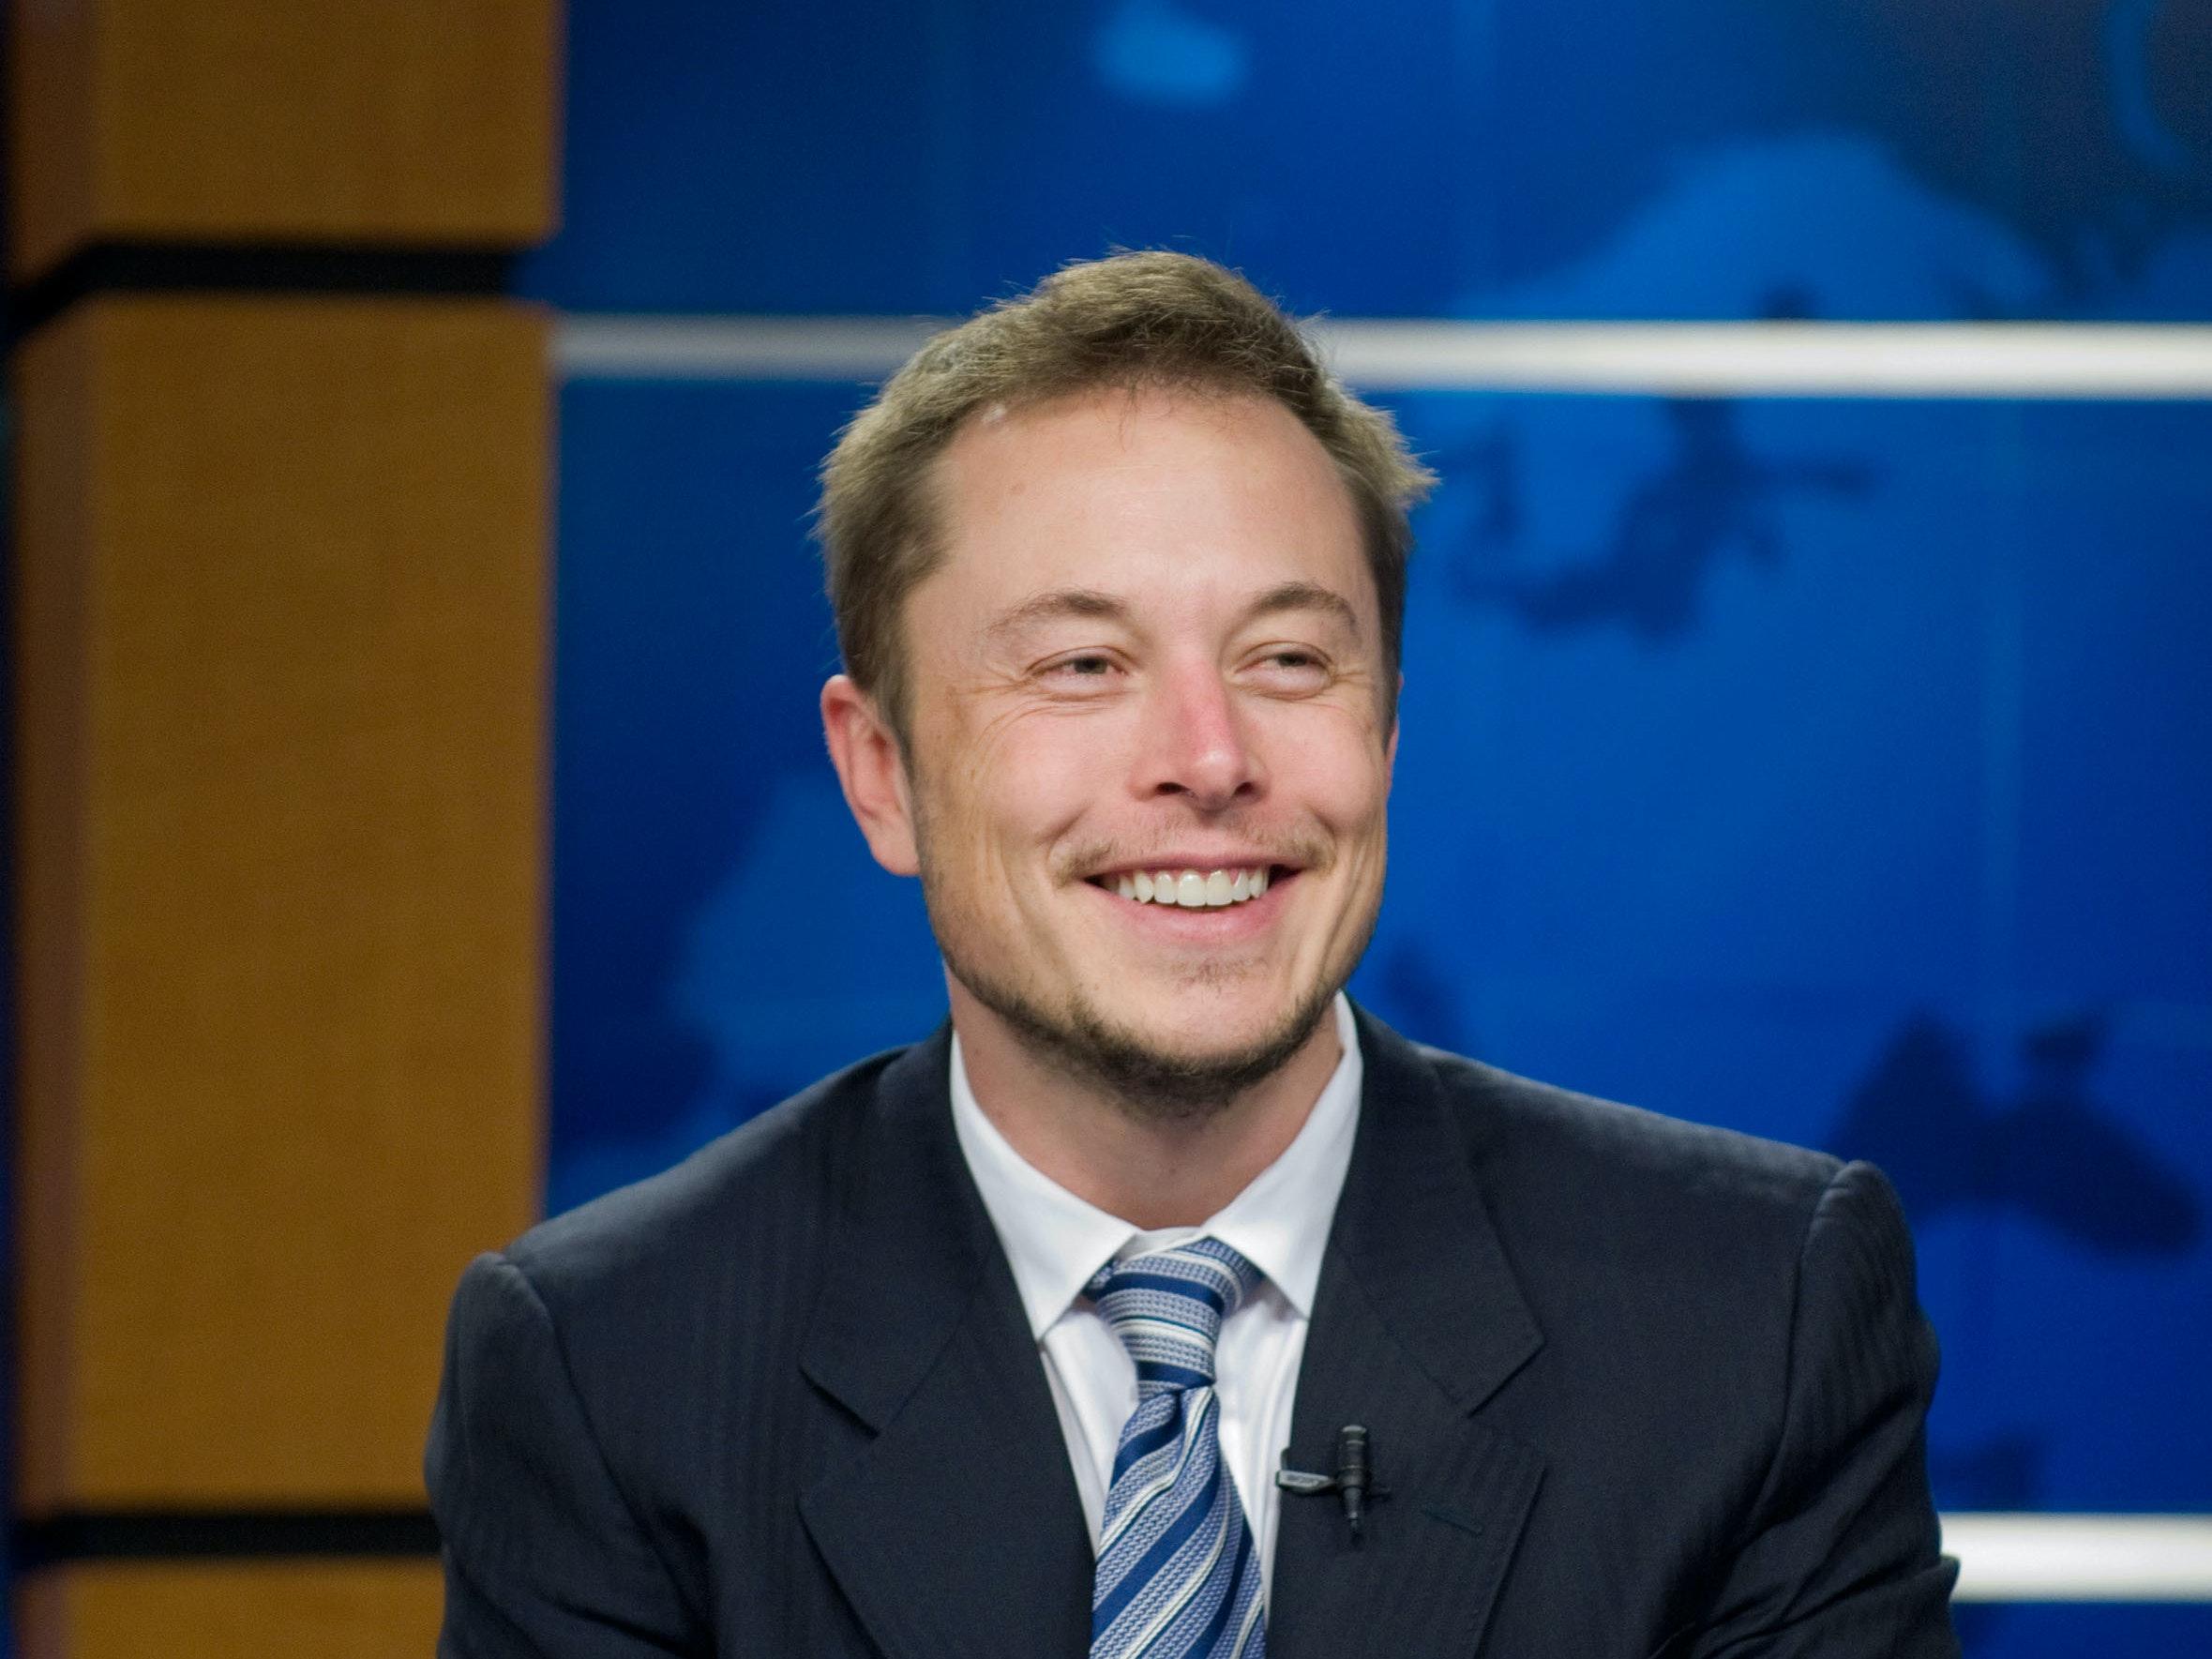 Elon Musk, Tesla Say Gigafactory 2 Will Be in Europe